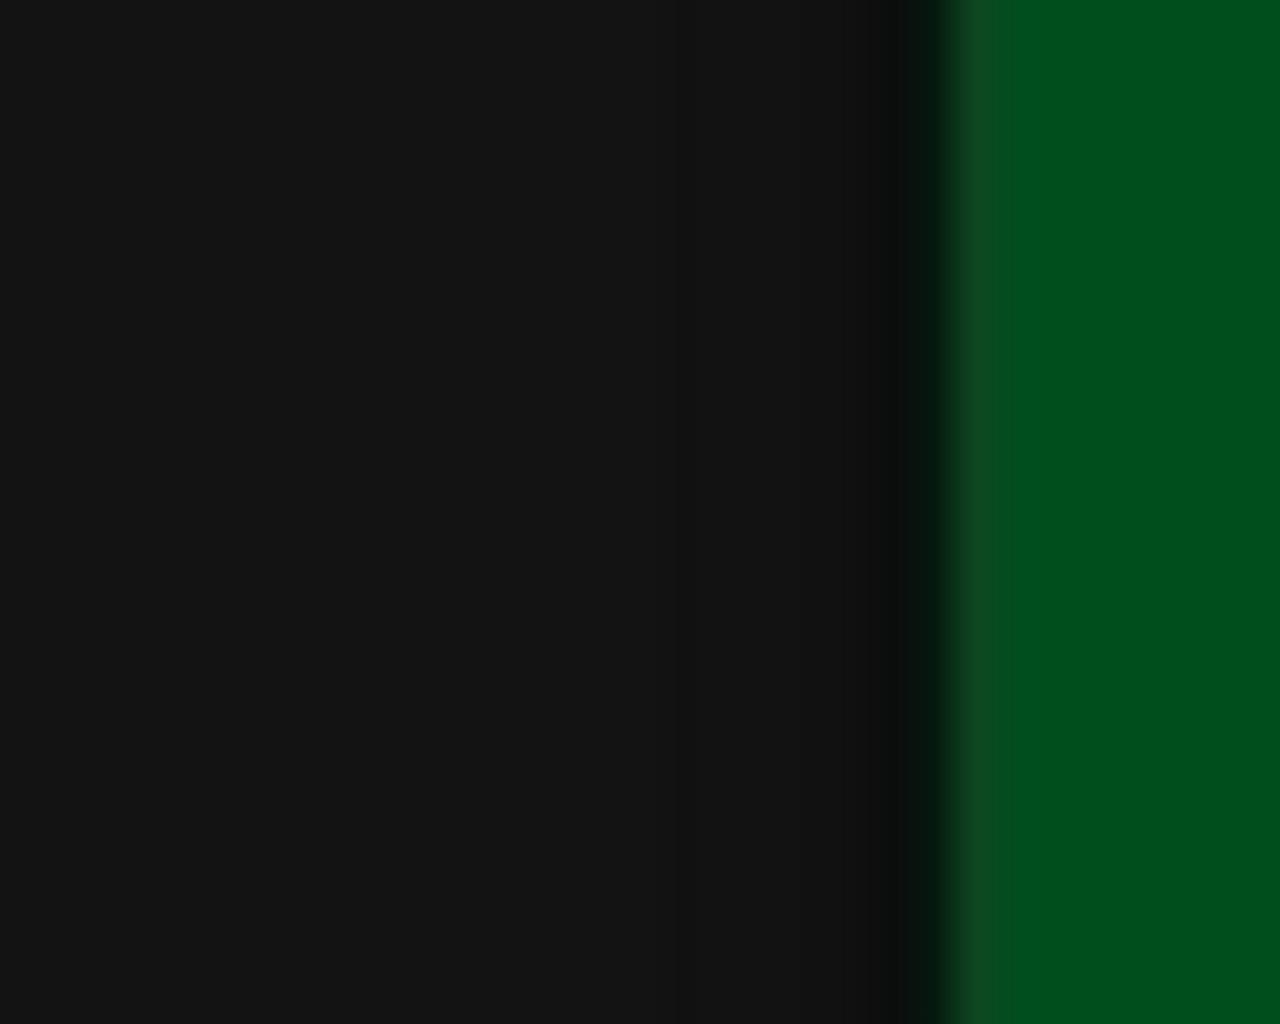 blackgreen3